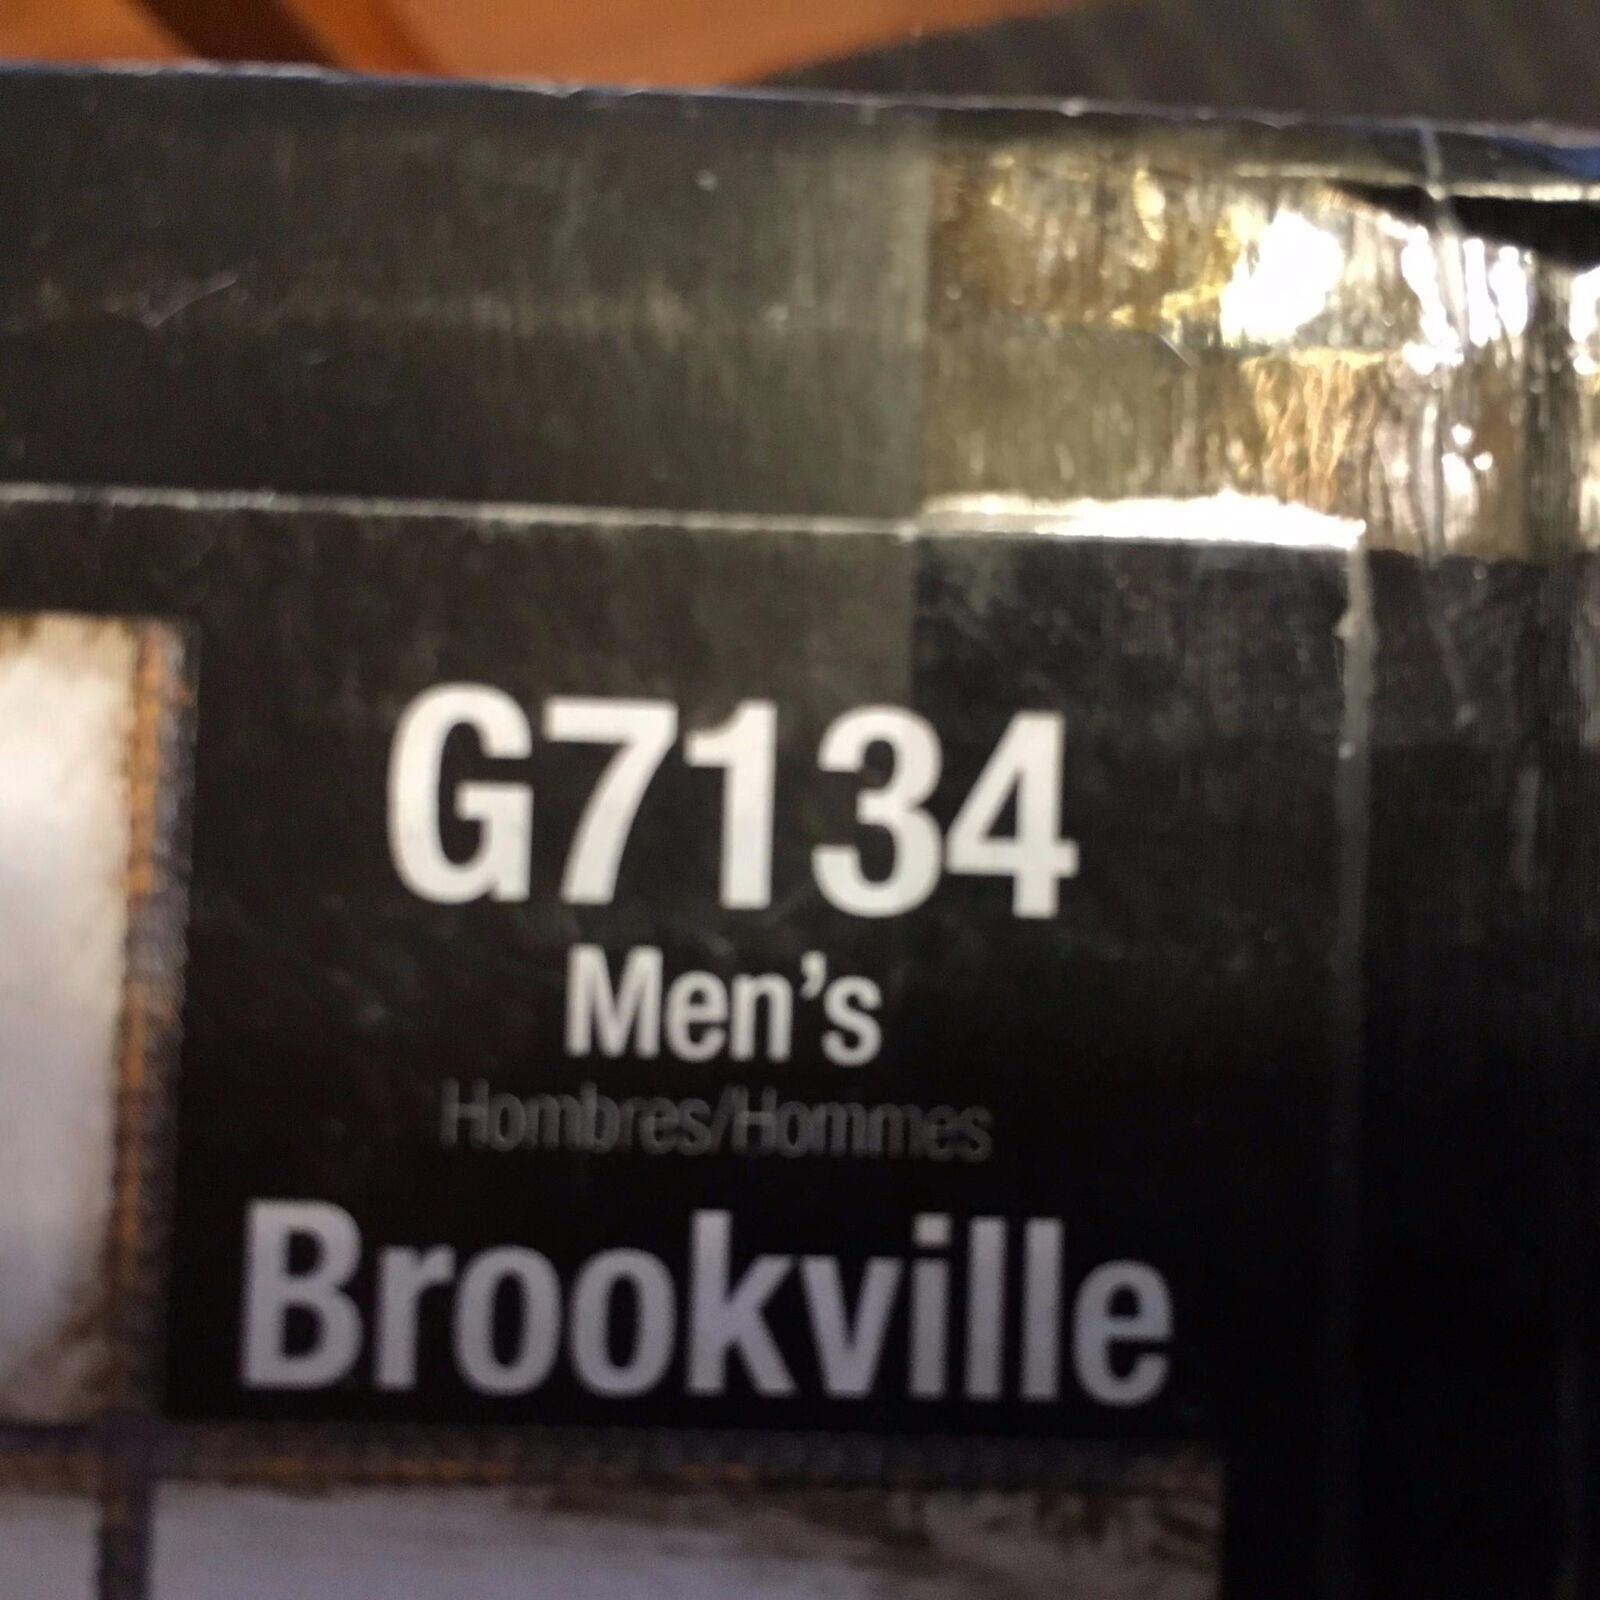 Georgia Para Hombre (721) brookville (721) Hombre Bota De Trabajo g7134 Marrón De Cuero m 0e11b0